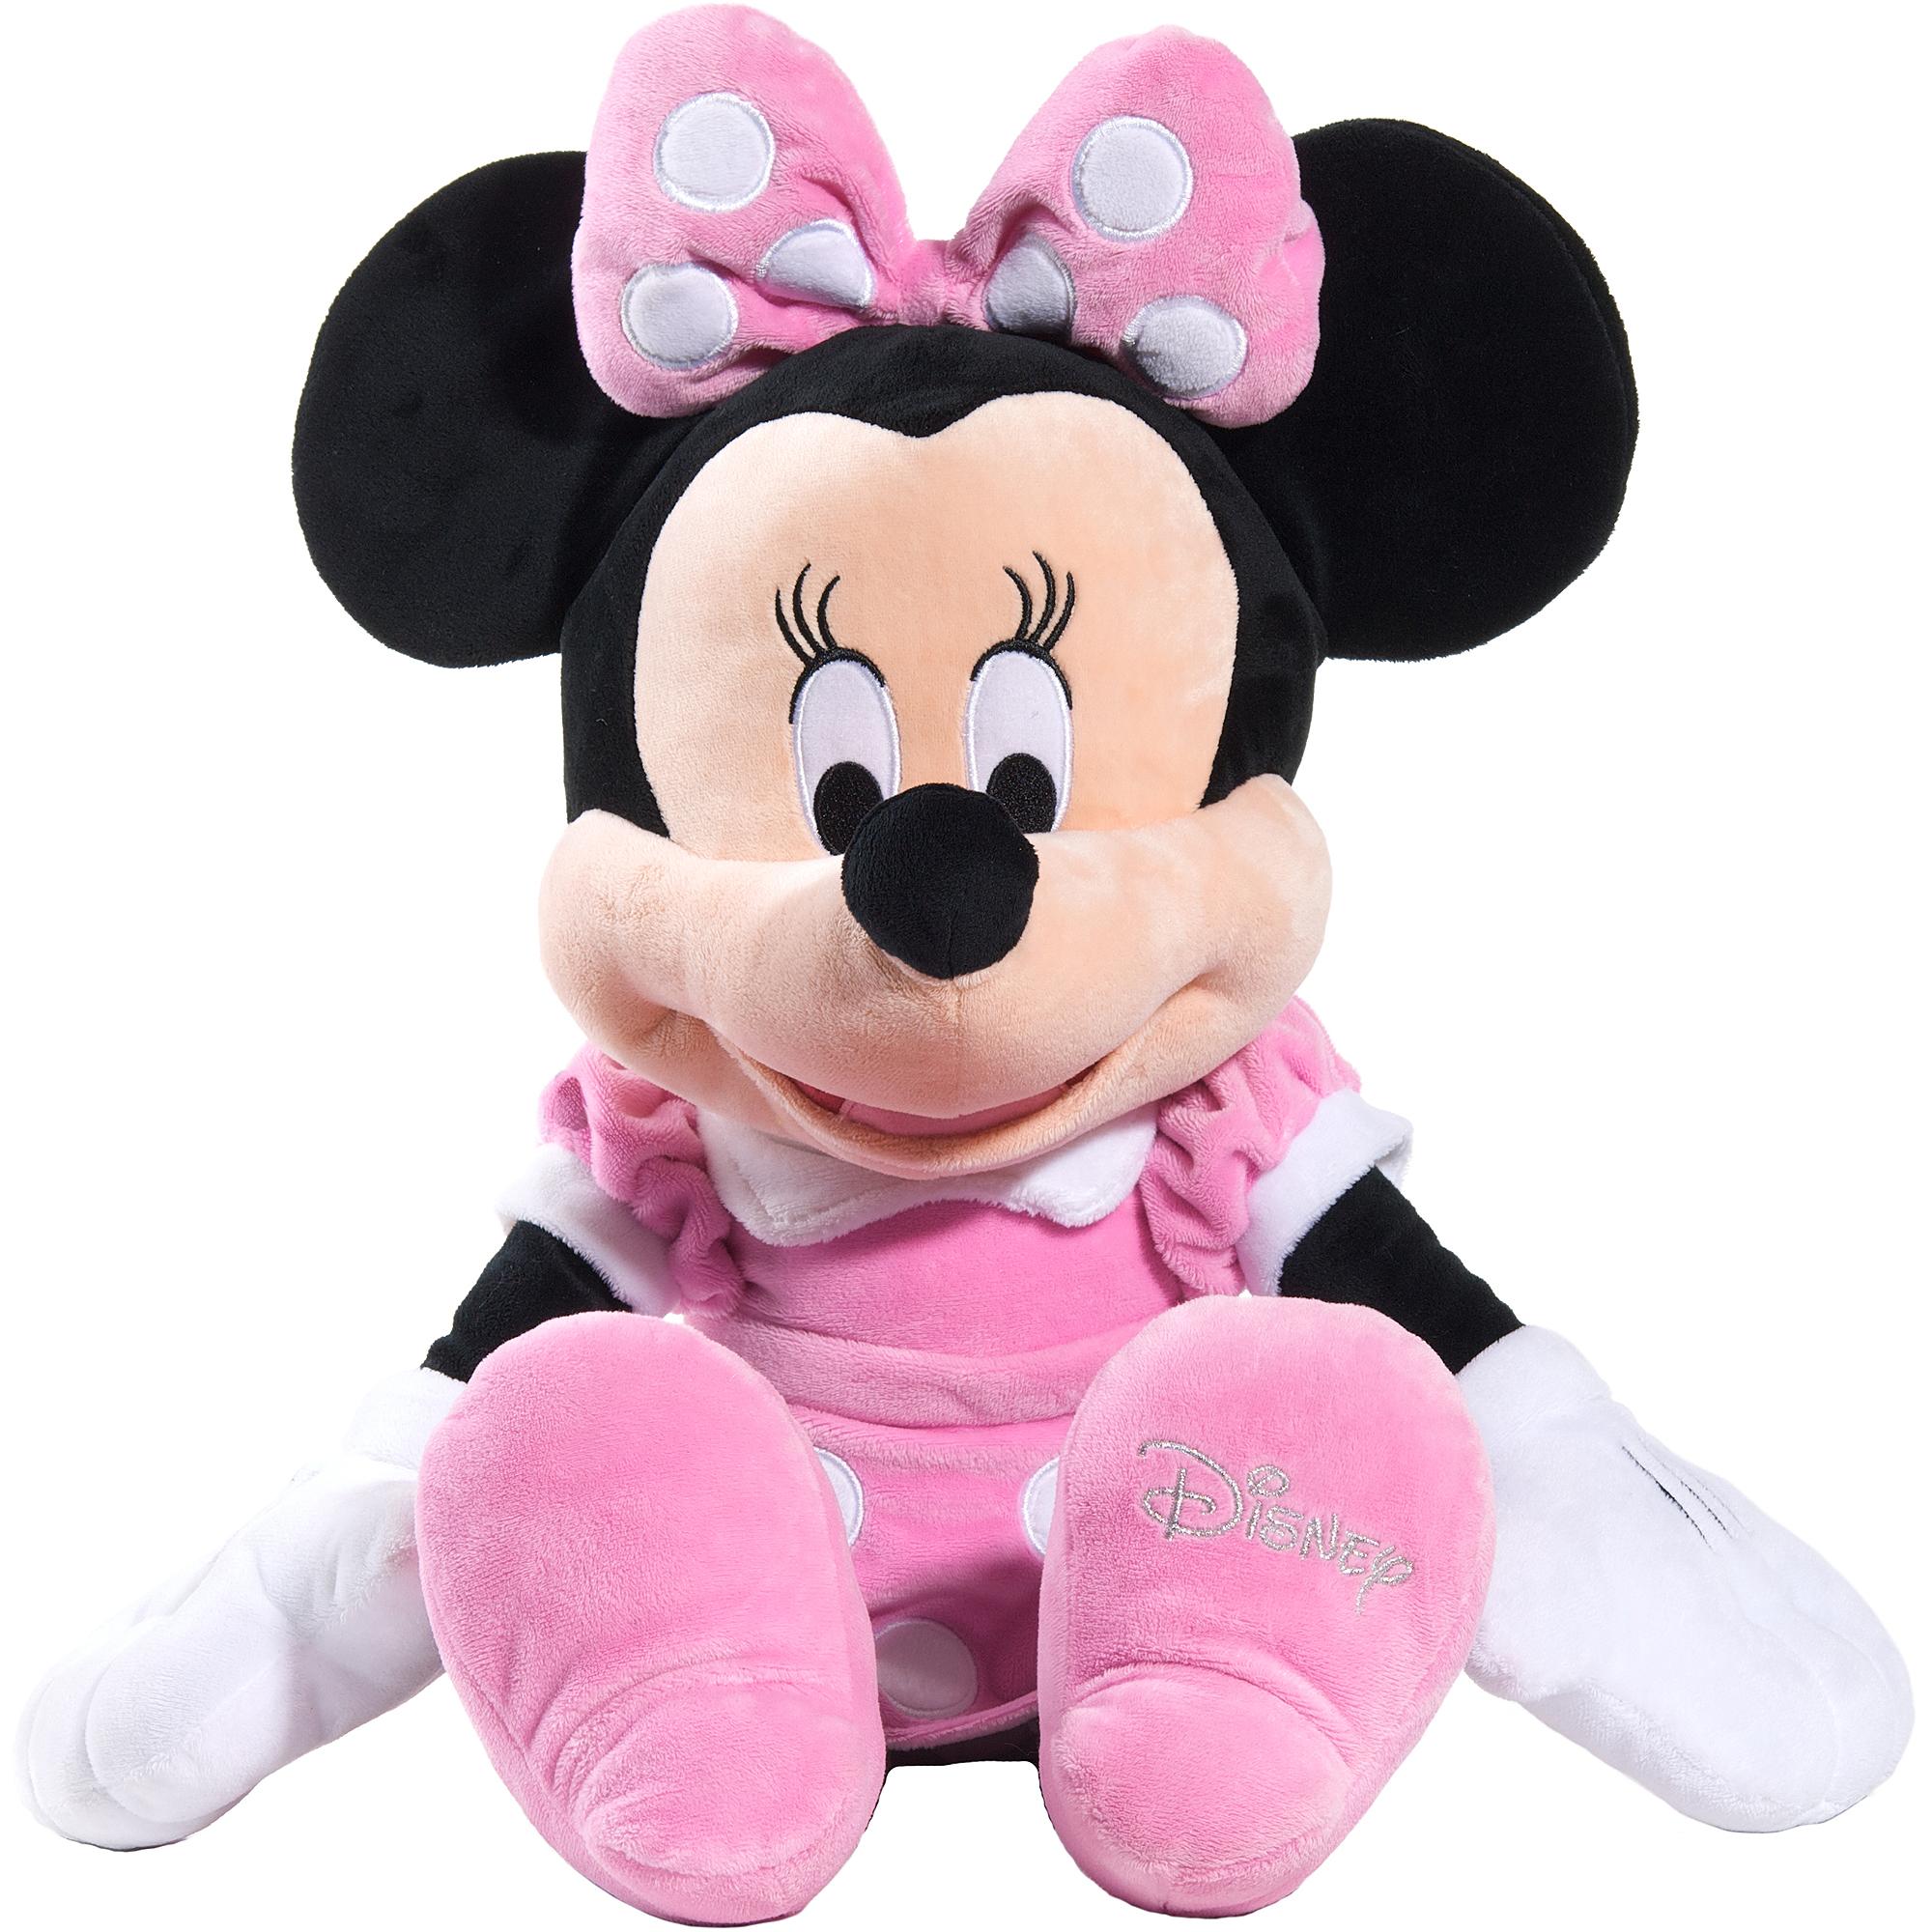 Disney Classic Large Plush Minnie Mouse Walmart Com